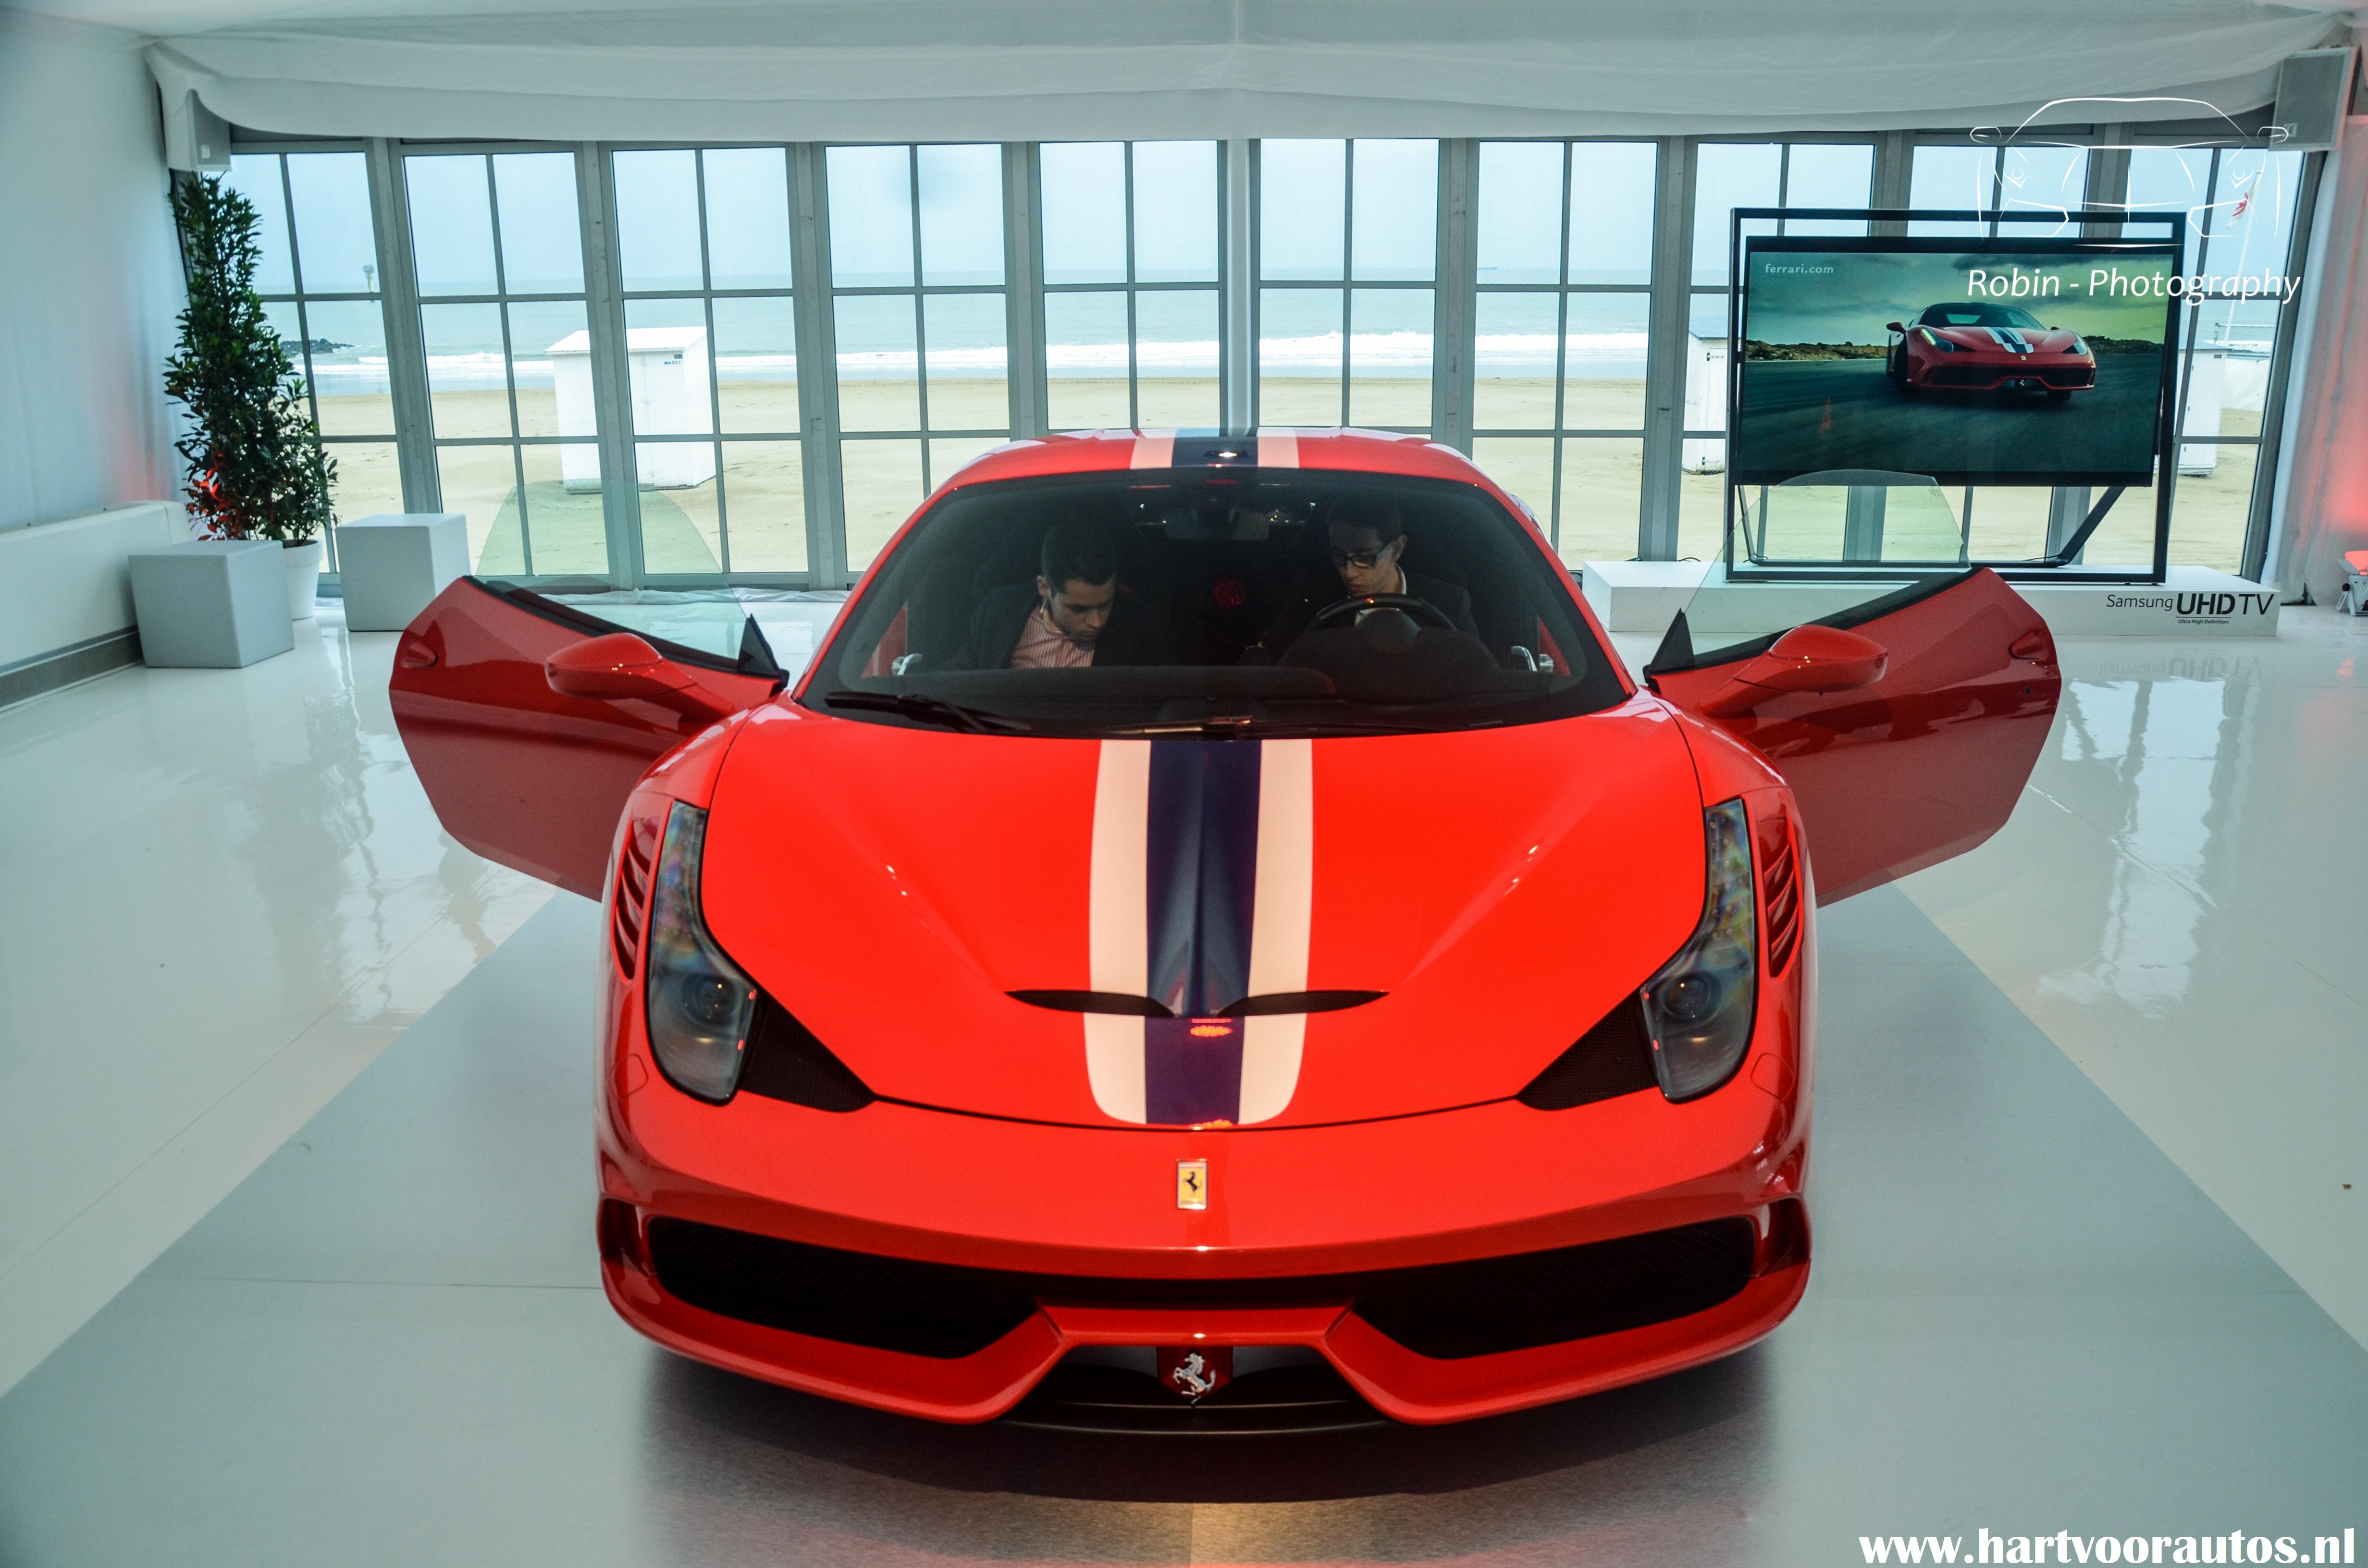 Ferrari 458 Speciale - www.hartvoorautos.nl